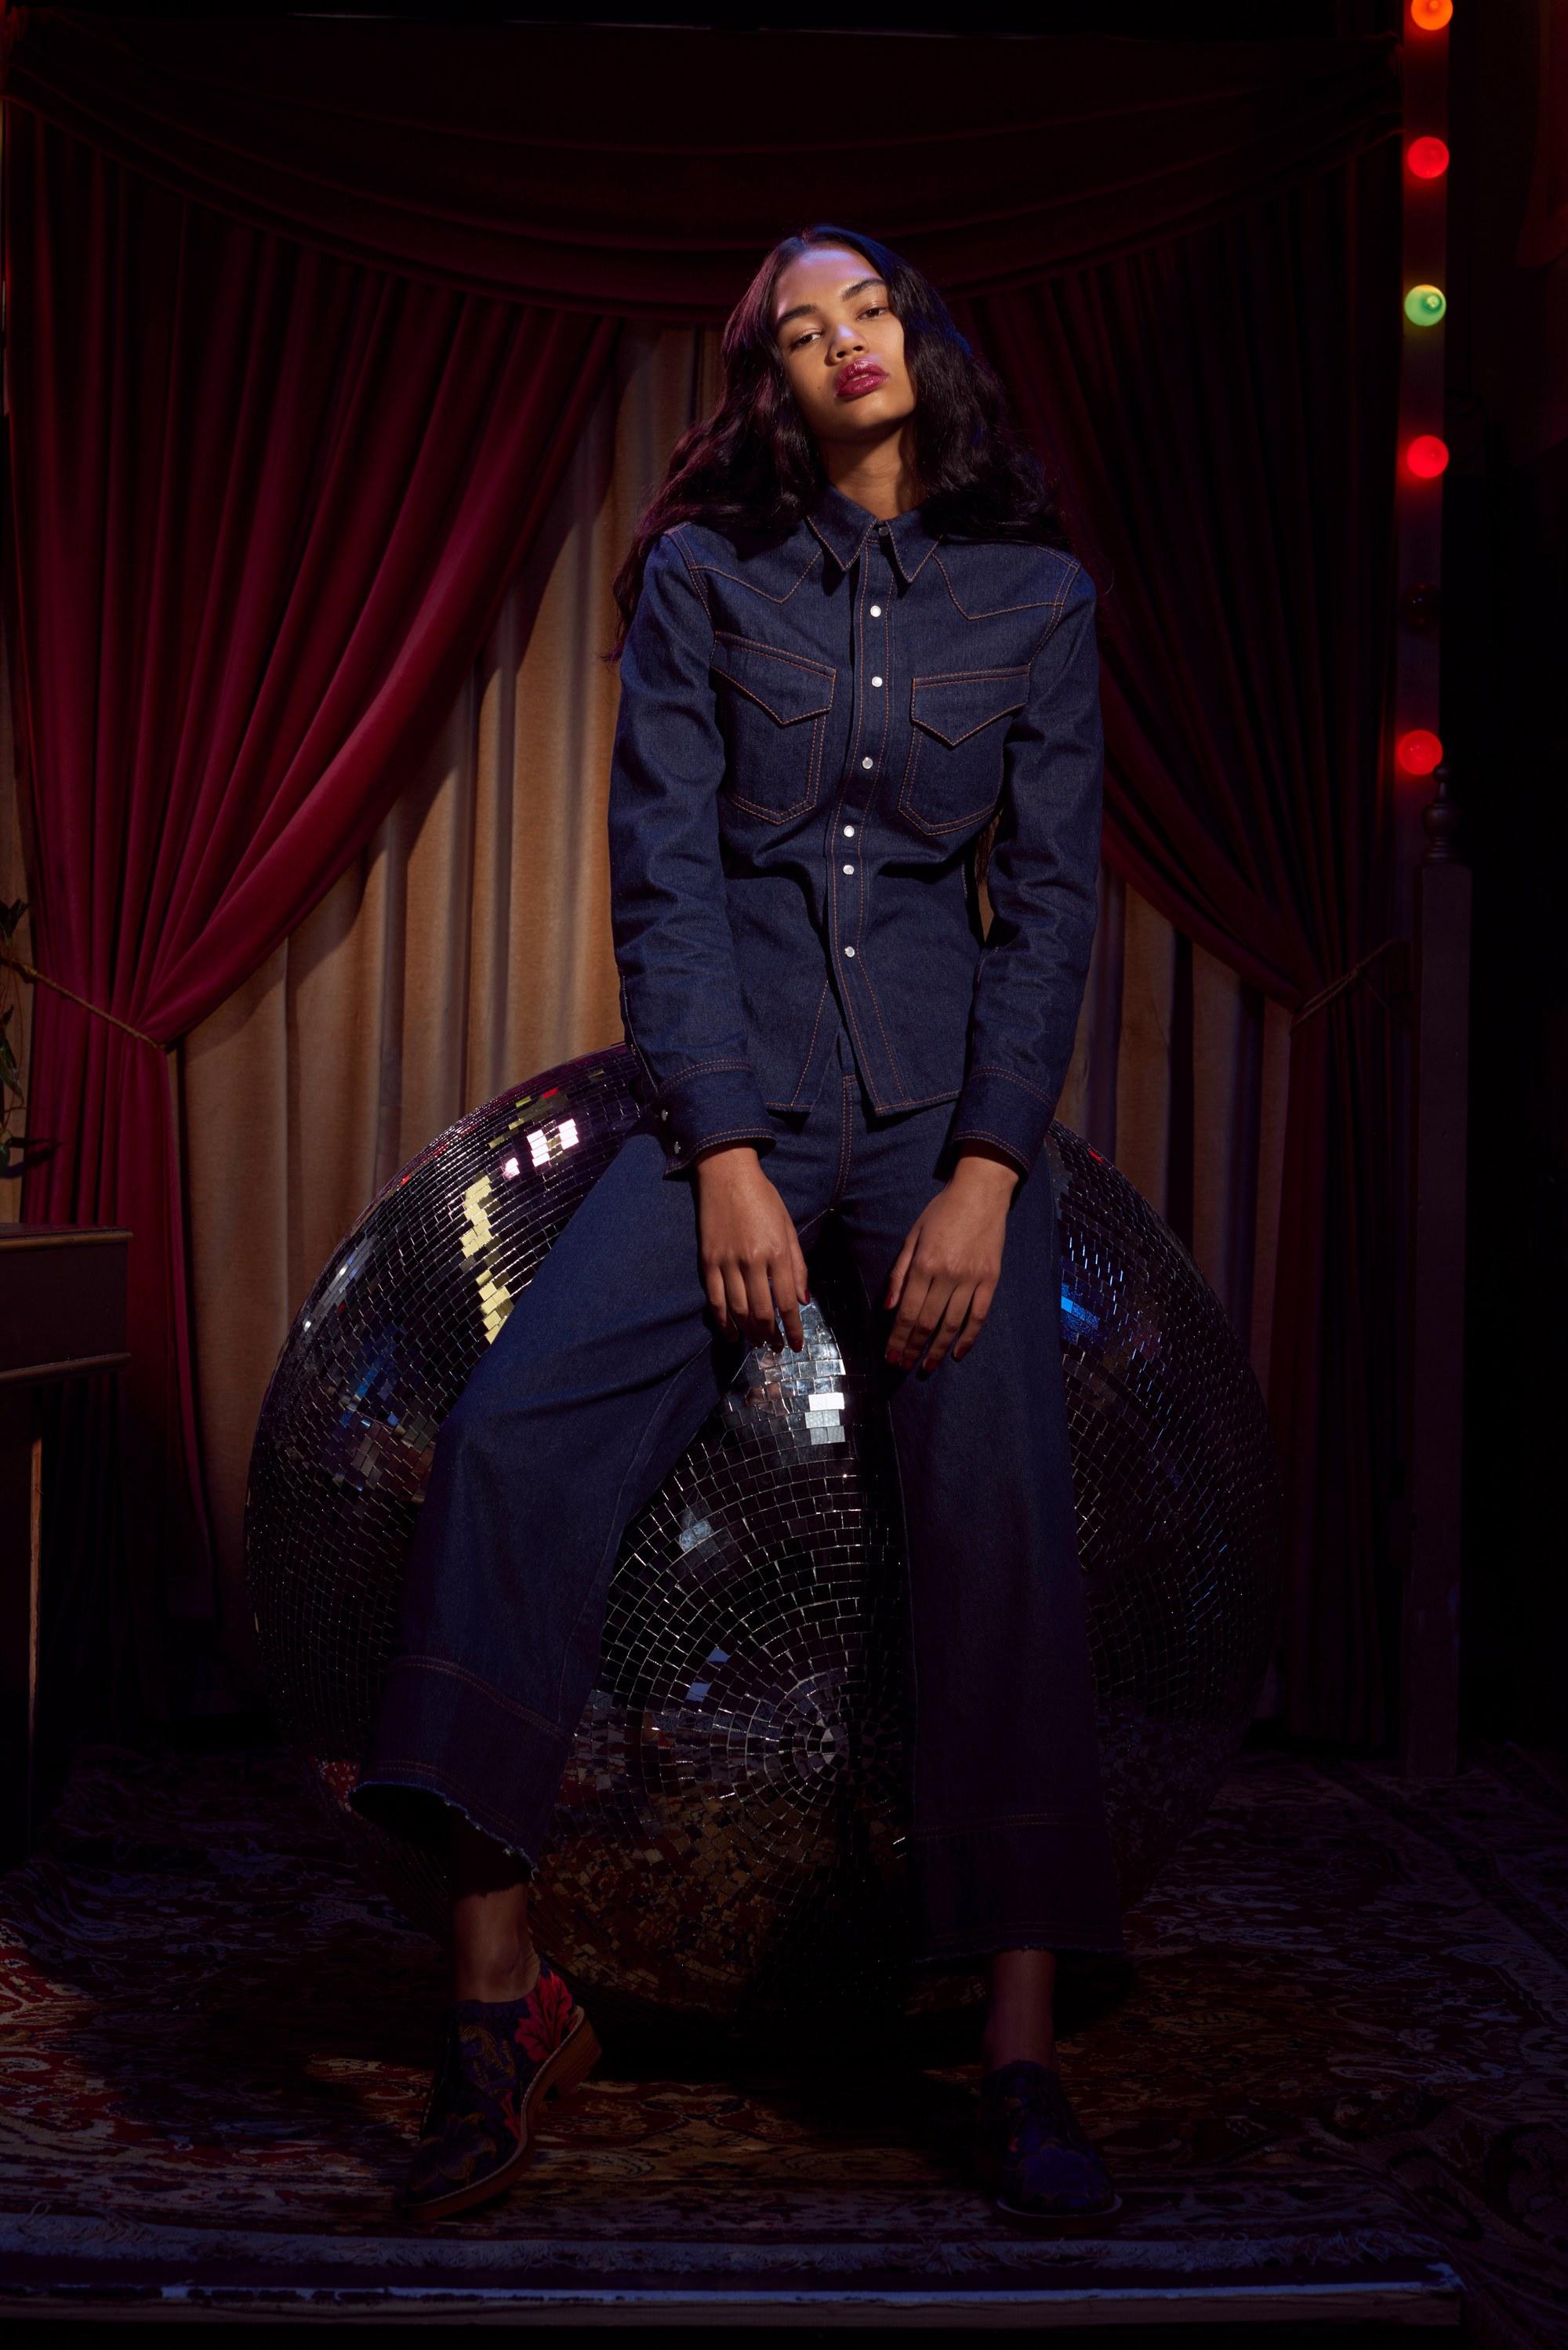 karen-walker-pre-fall-2017-fashion-show-the-impression-04